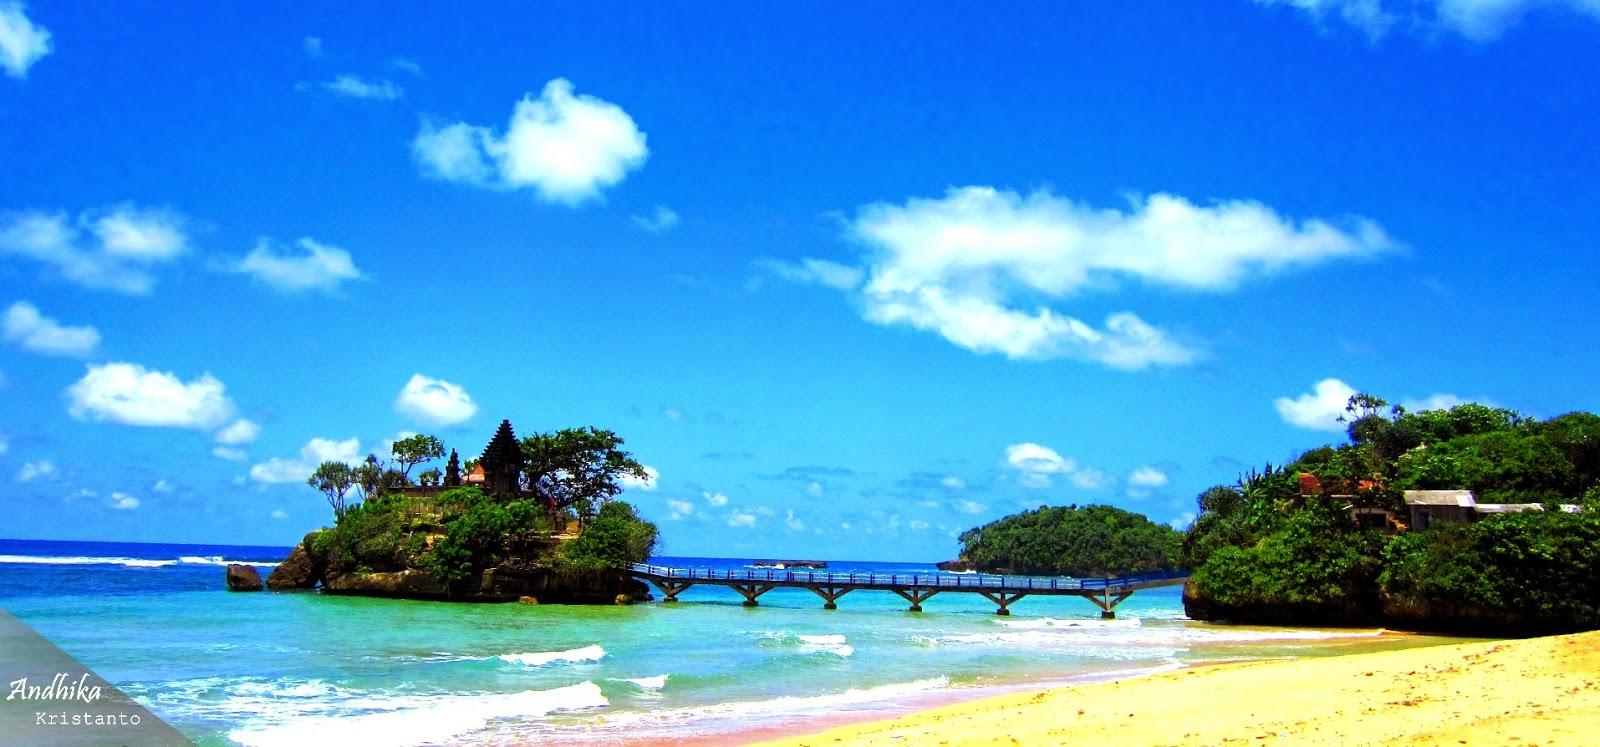 Serunya Berwisata Ke Pantai Balekambang Malang Dunia Pariwisata